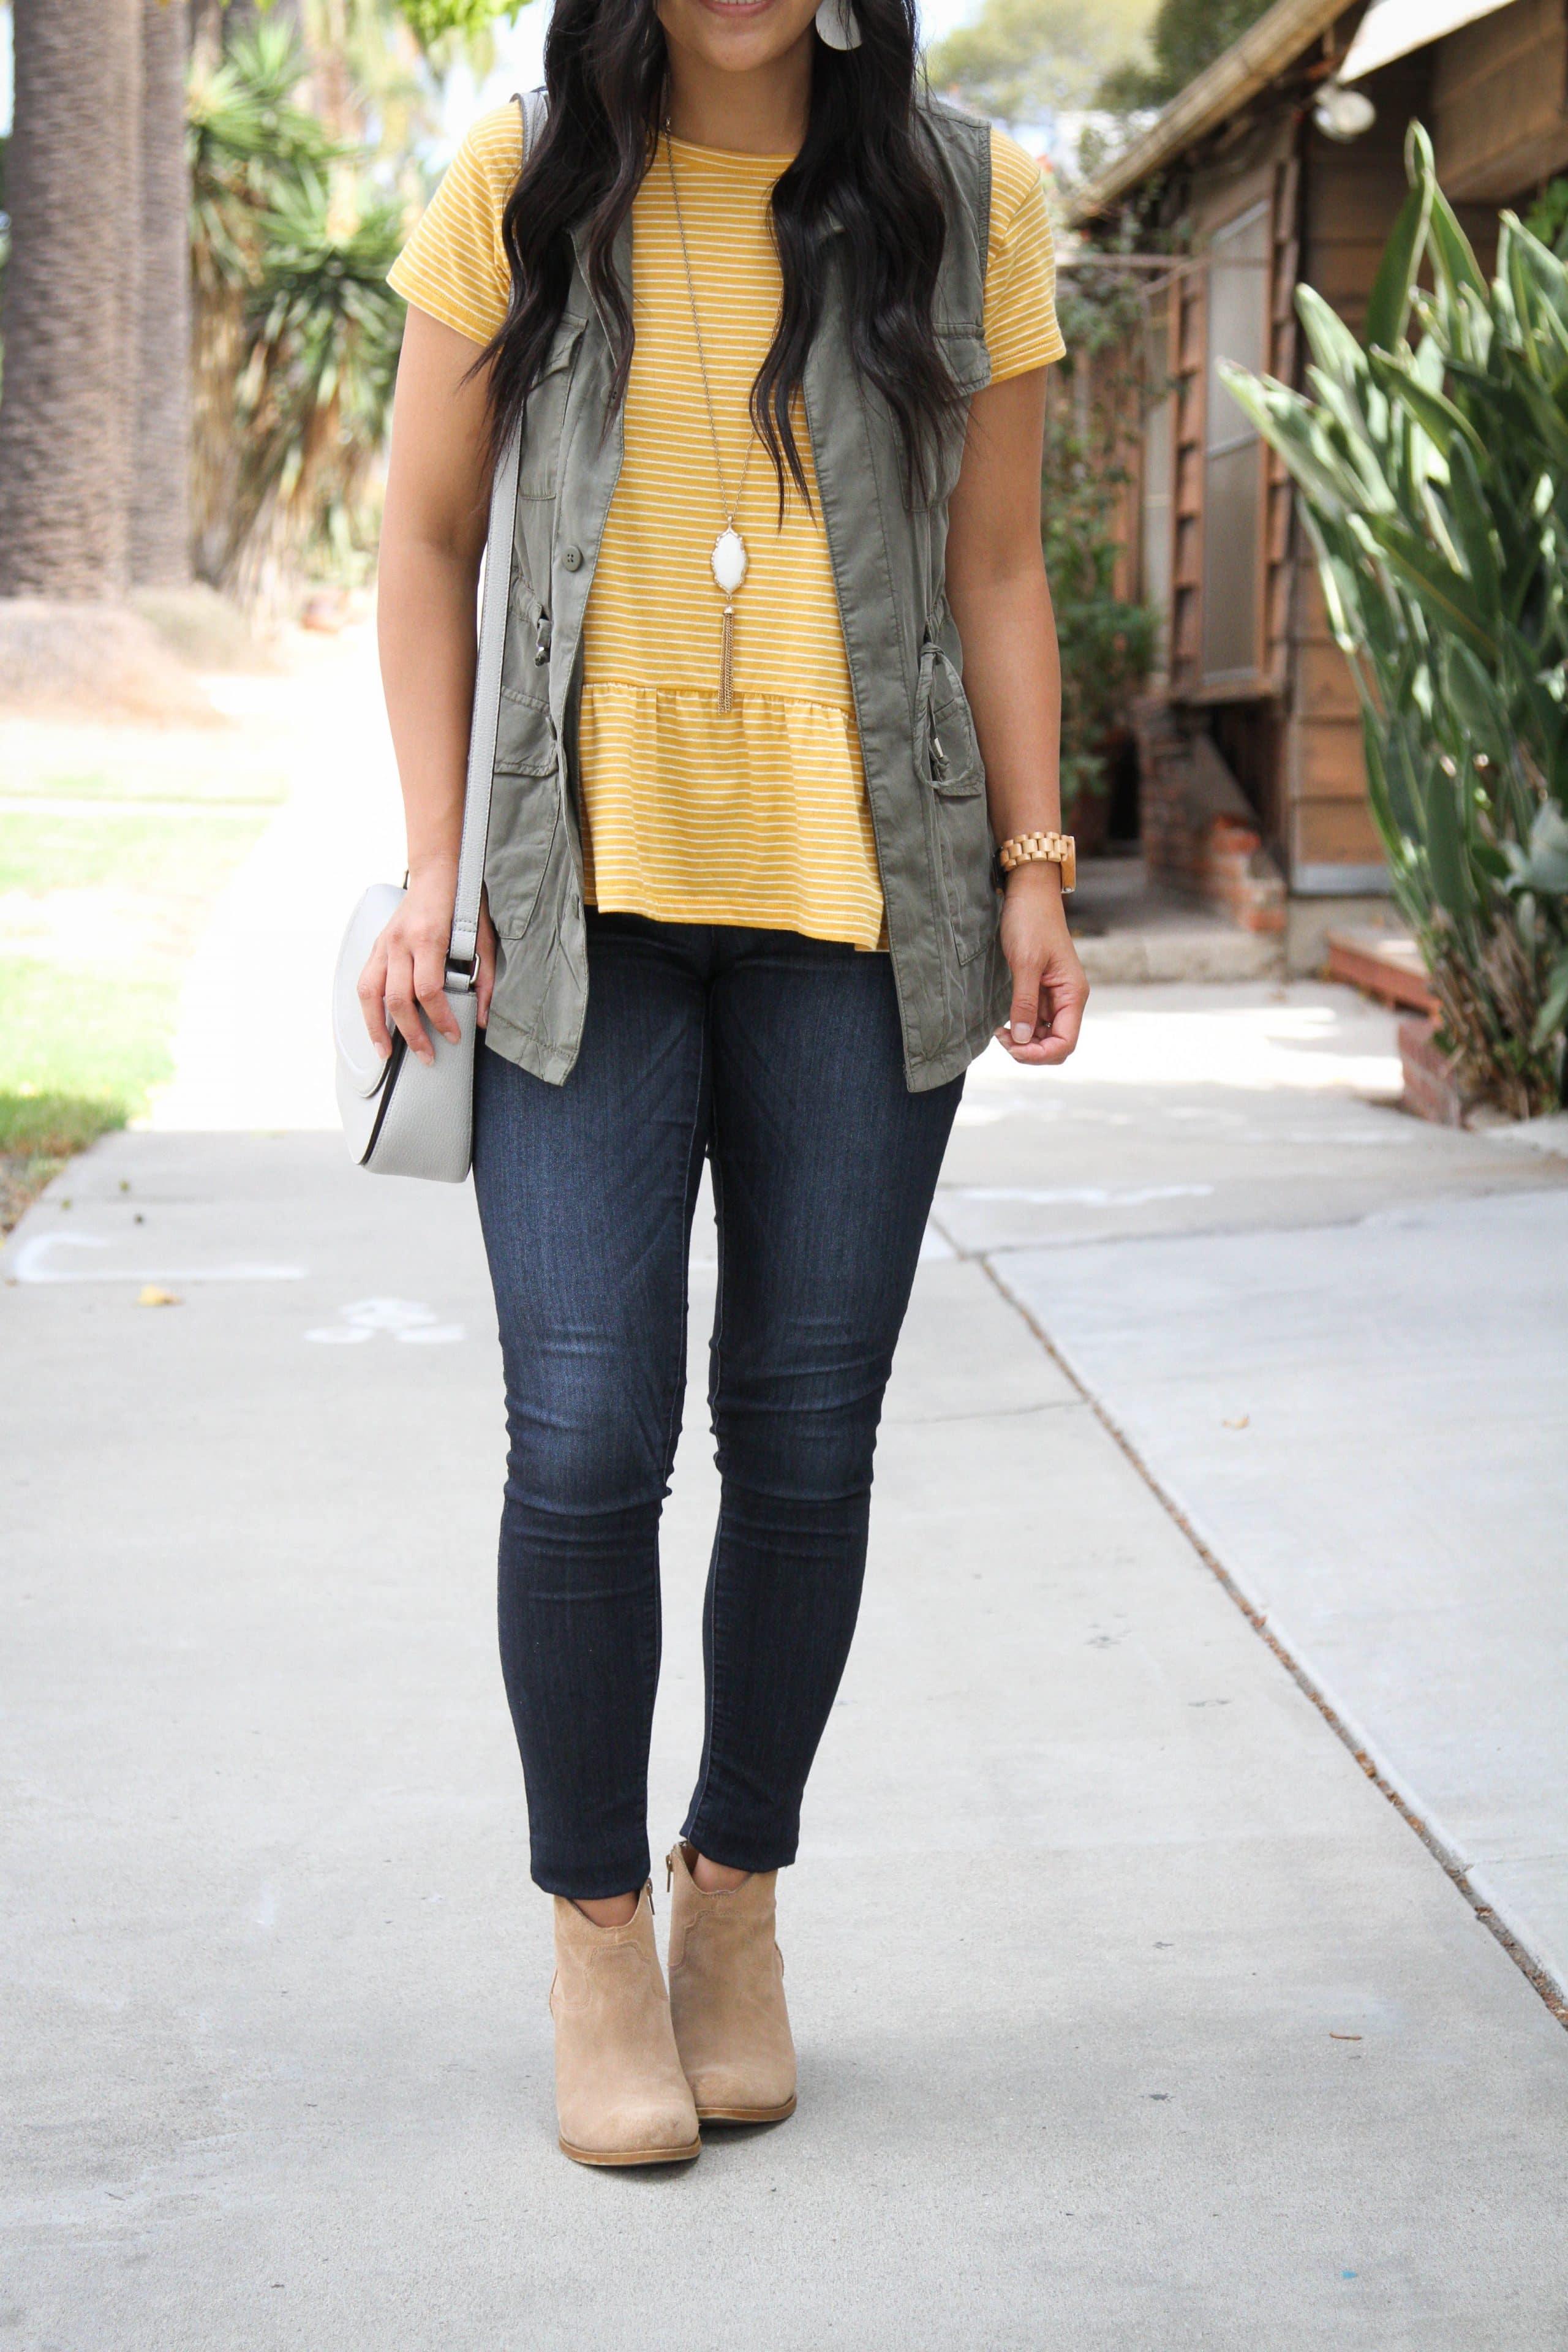 Denim Skinnies + Yellow Peplum Tee + Utility Vest + Taupe Booties + Gray Bag